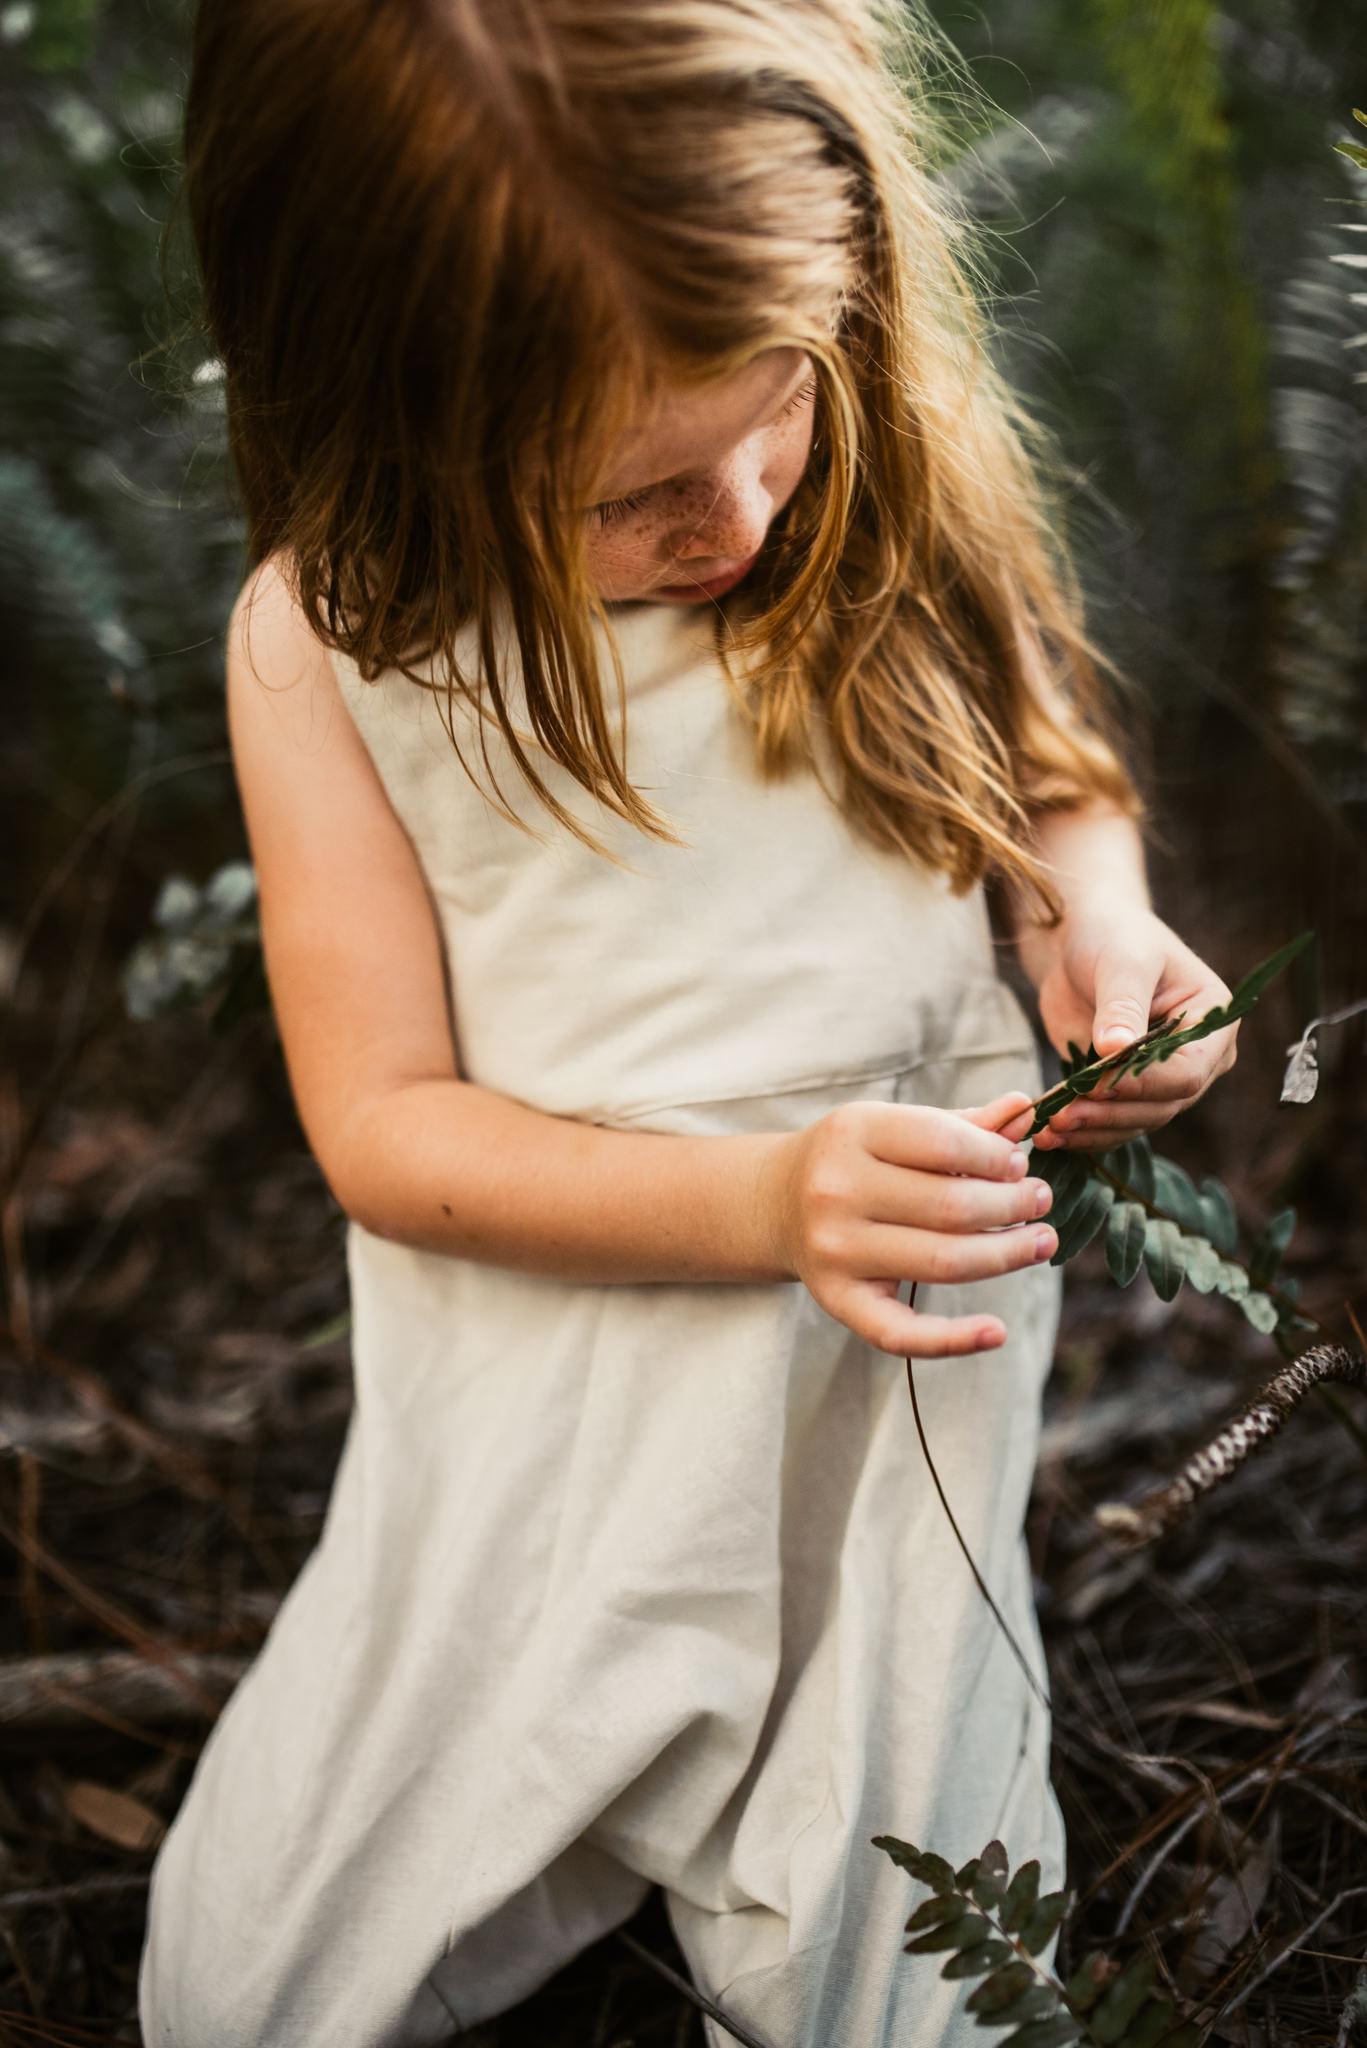 twyla jones photography - treasure coast florida - childrens adventure clothing commercial shoot--46.jpg